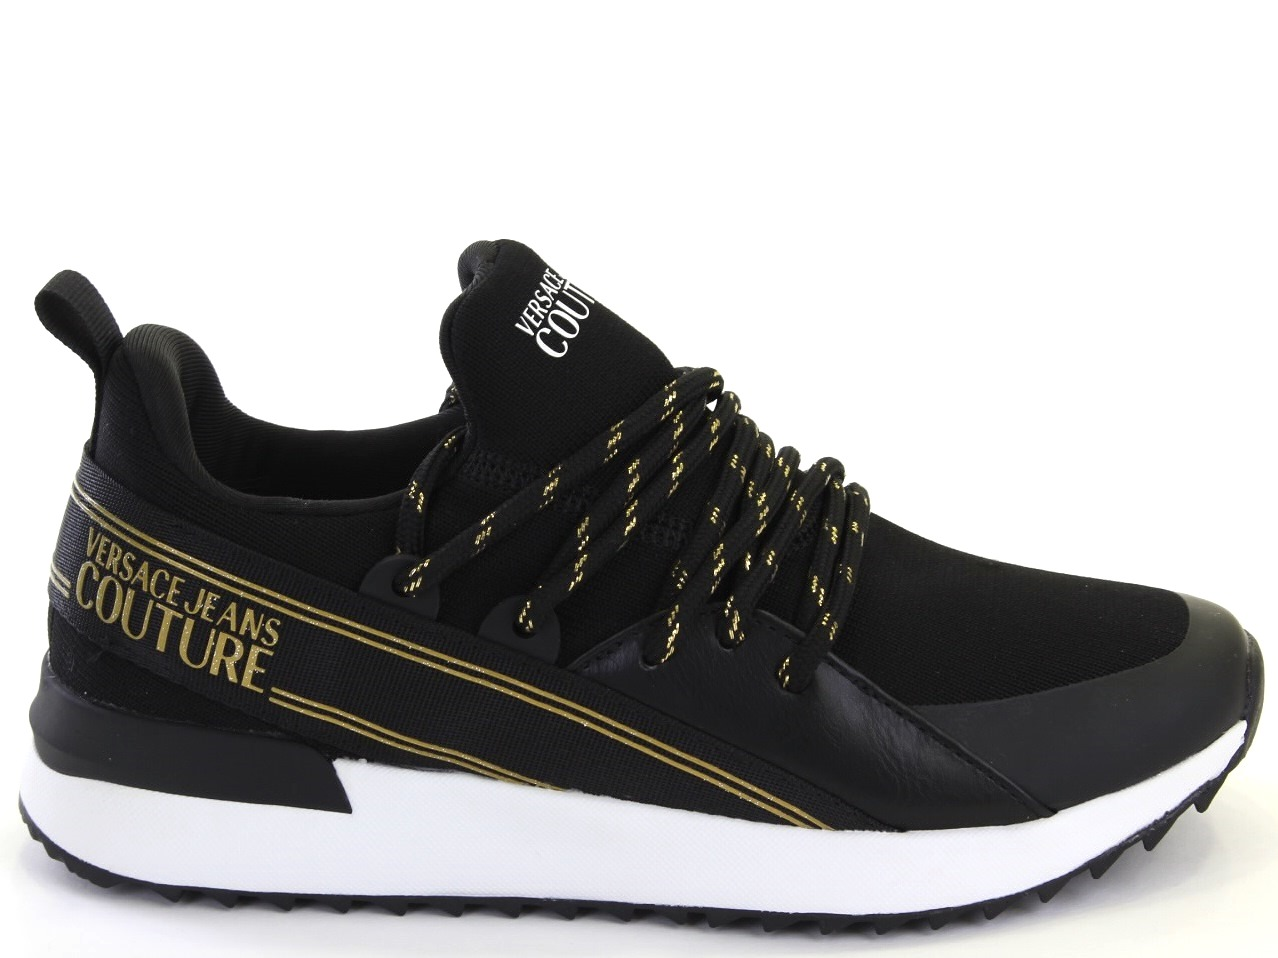 Sneakers and Espadrilles Versace Jeans - 652 E0VZASGI 80041